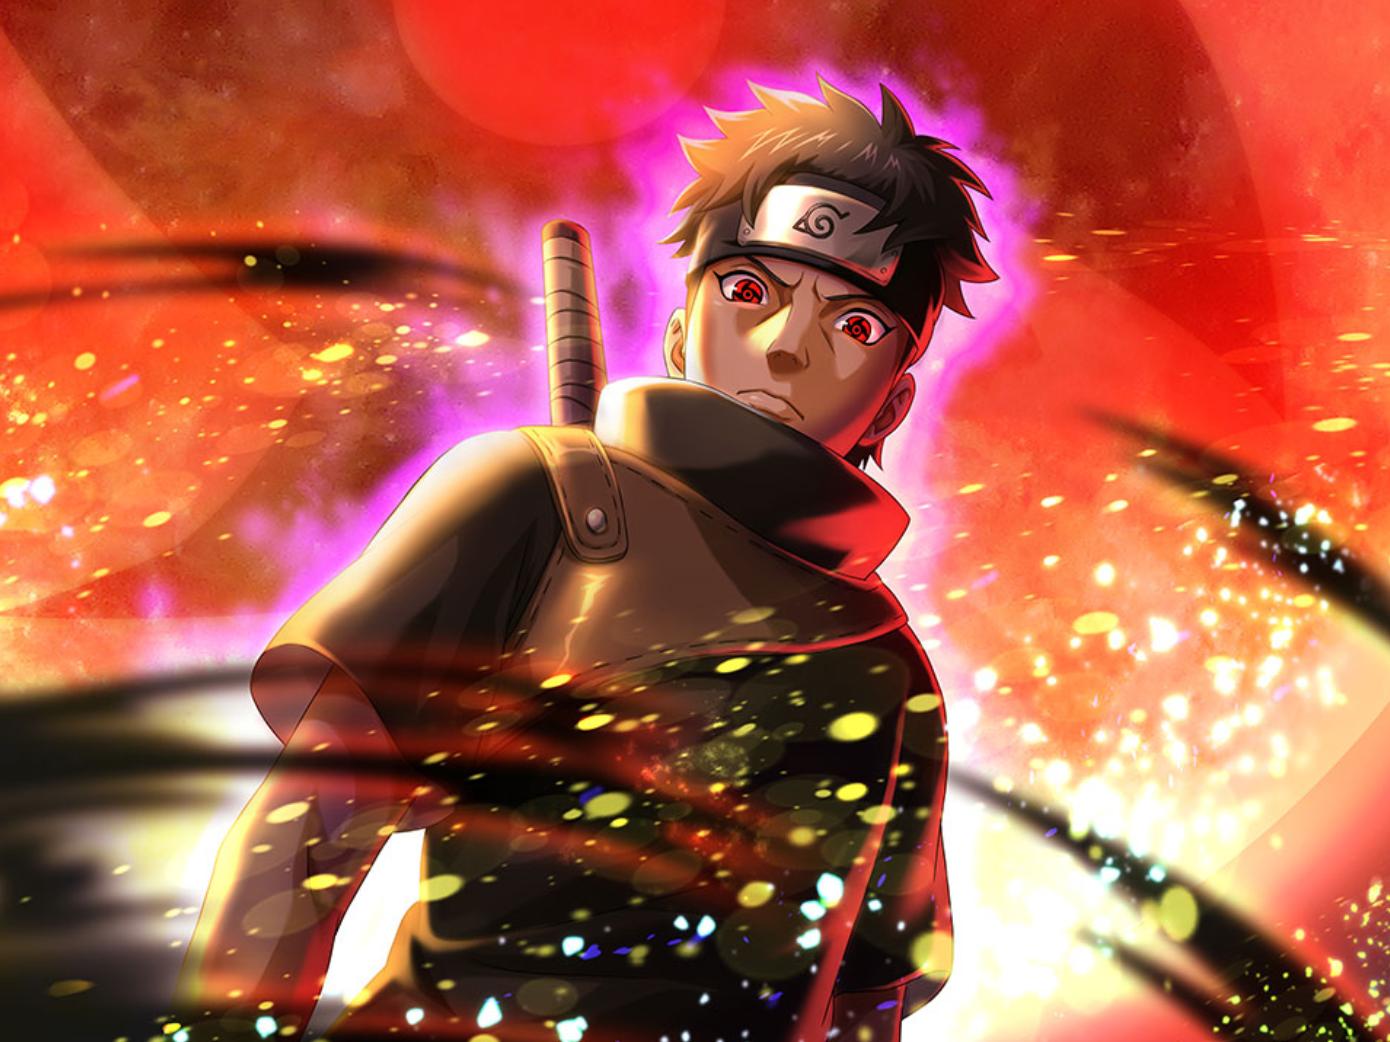 Shisui ultimate   Shisui, Uchiha, Naruto shippuden anime